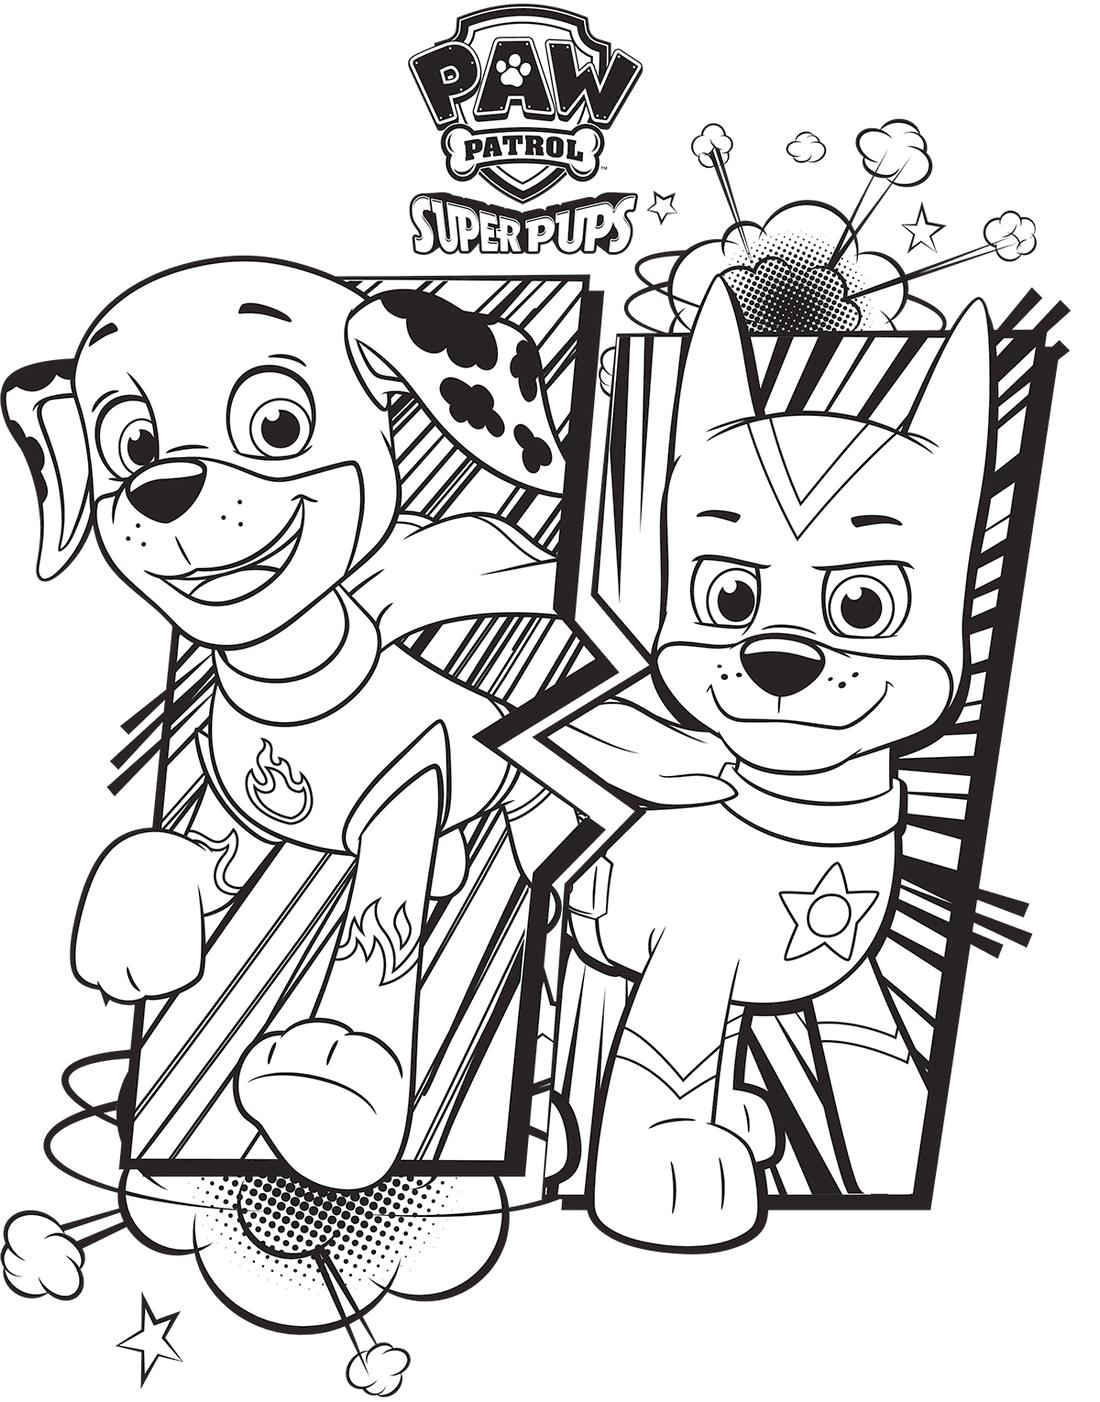 paw-patrol-super-pups-coloring-books